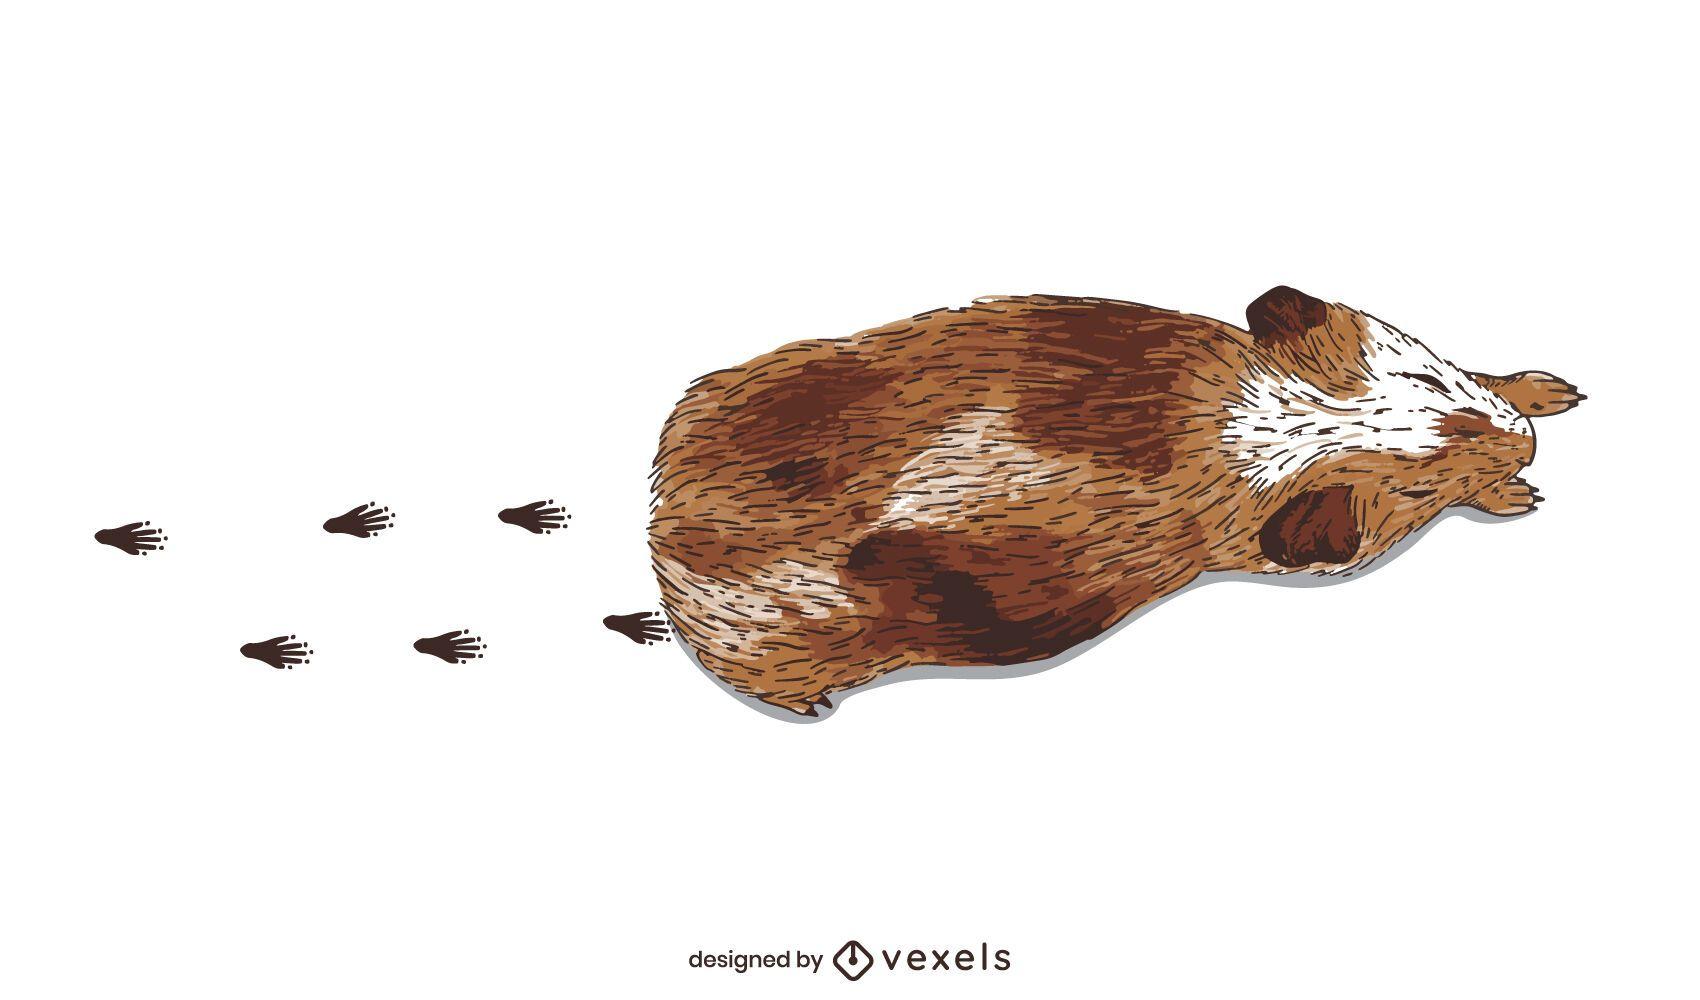 Guinea pig trail illustration